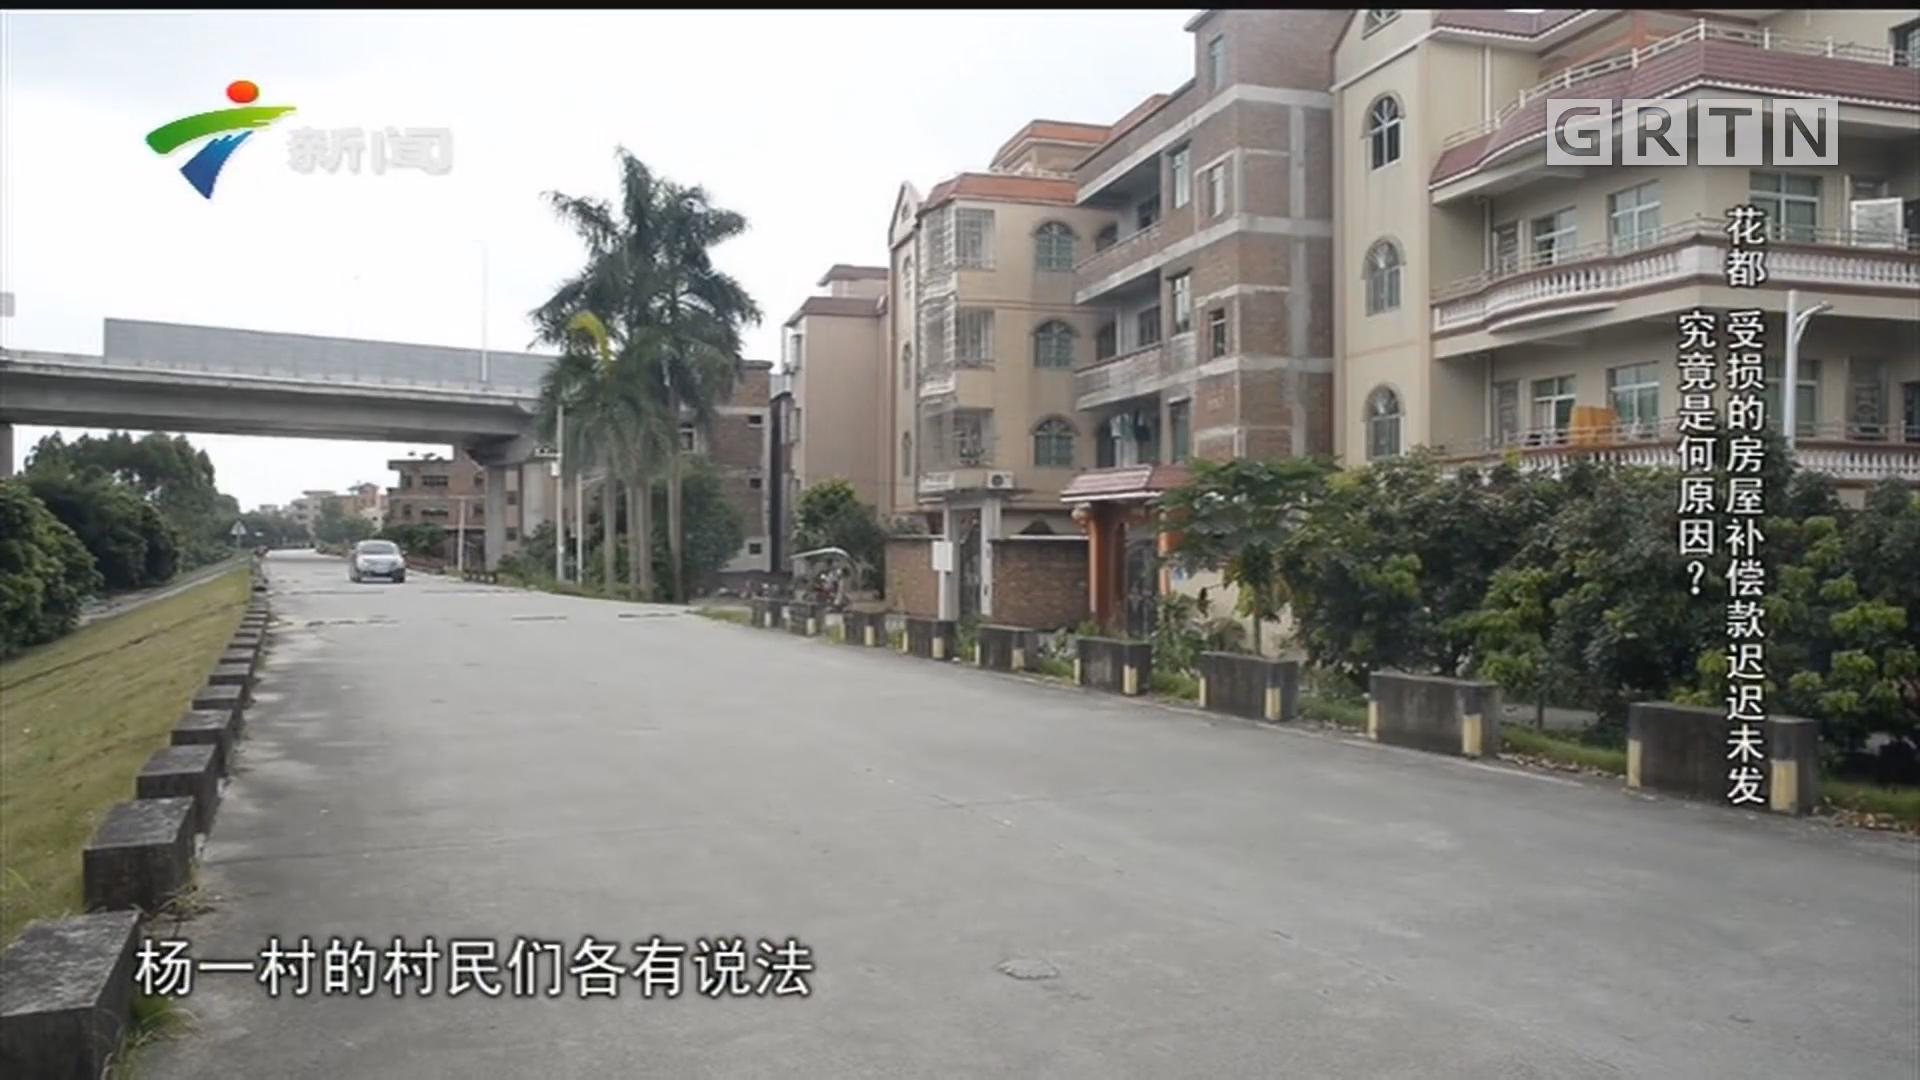 [HD][2019-07-18]社會縱橫:花都 受損的房屋補償款遲遲未發 究竟是何原因?